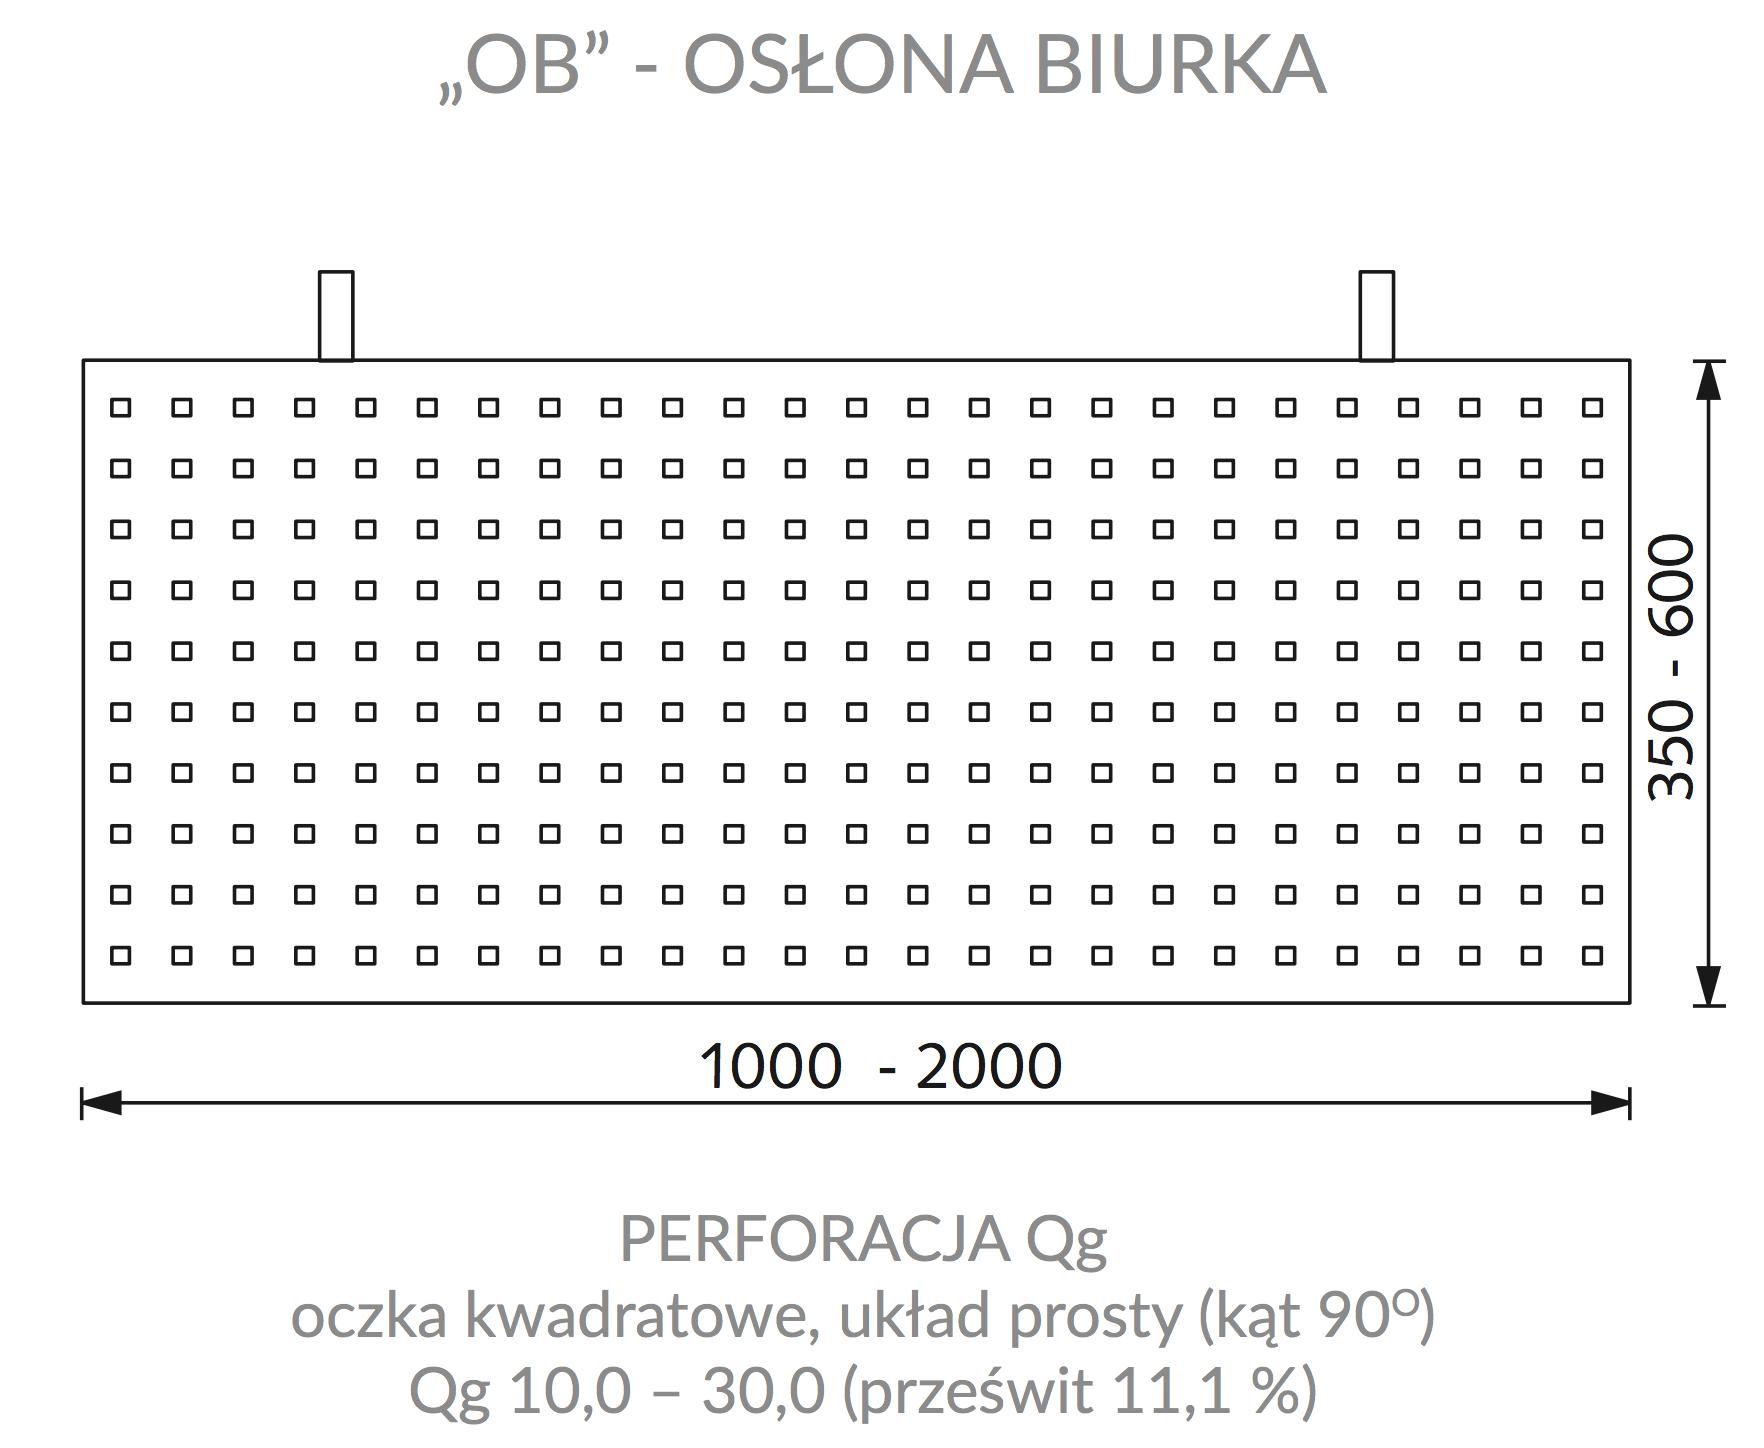 OB - osłona biurka z blachy perforowanej